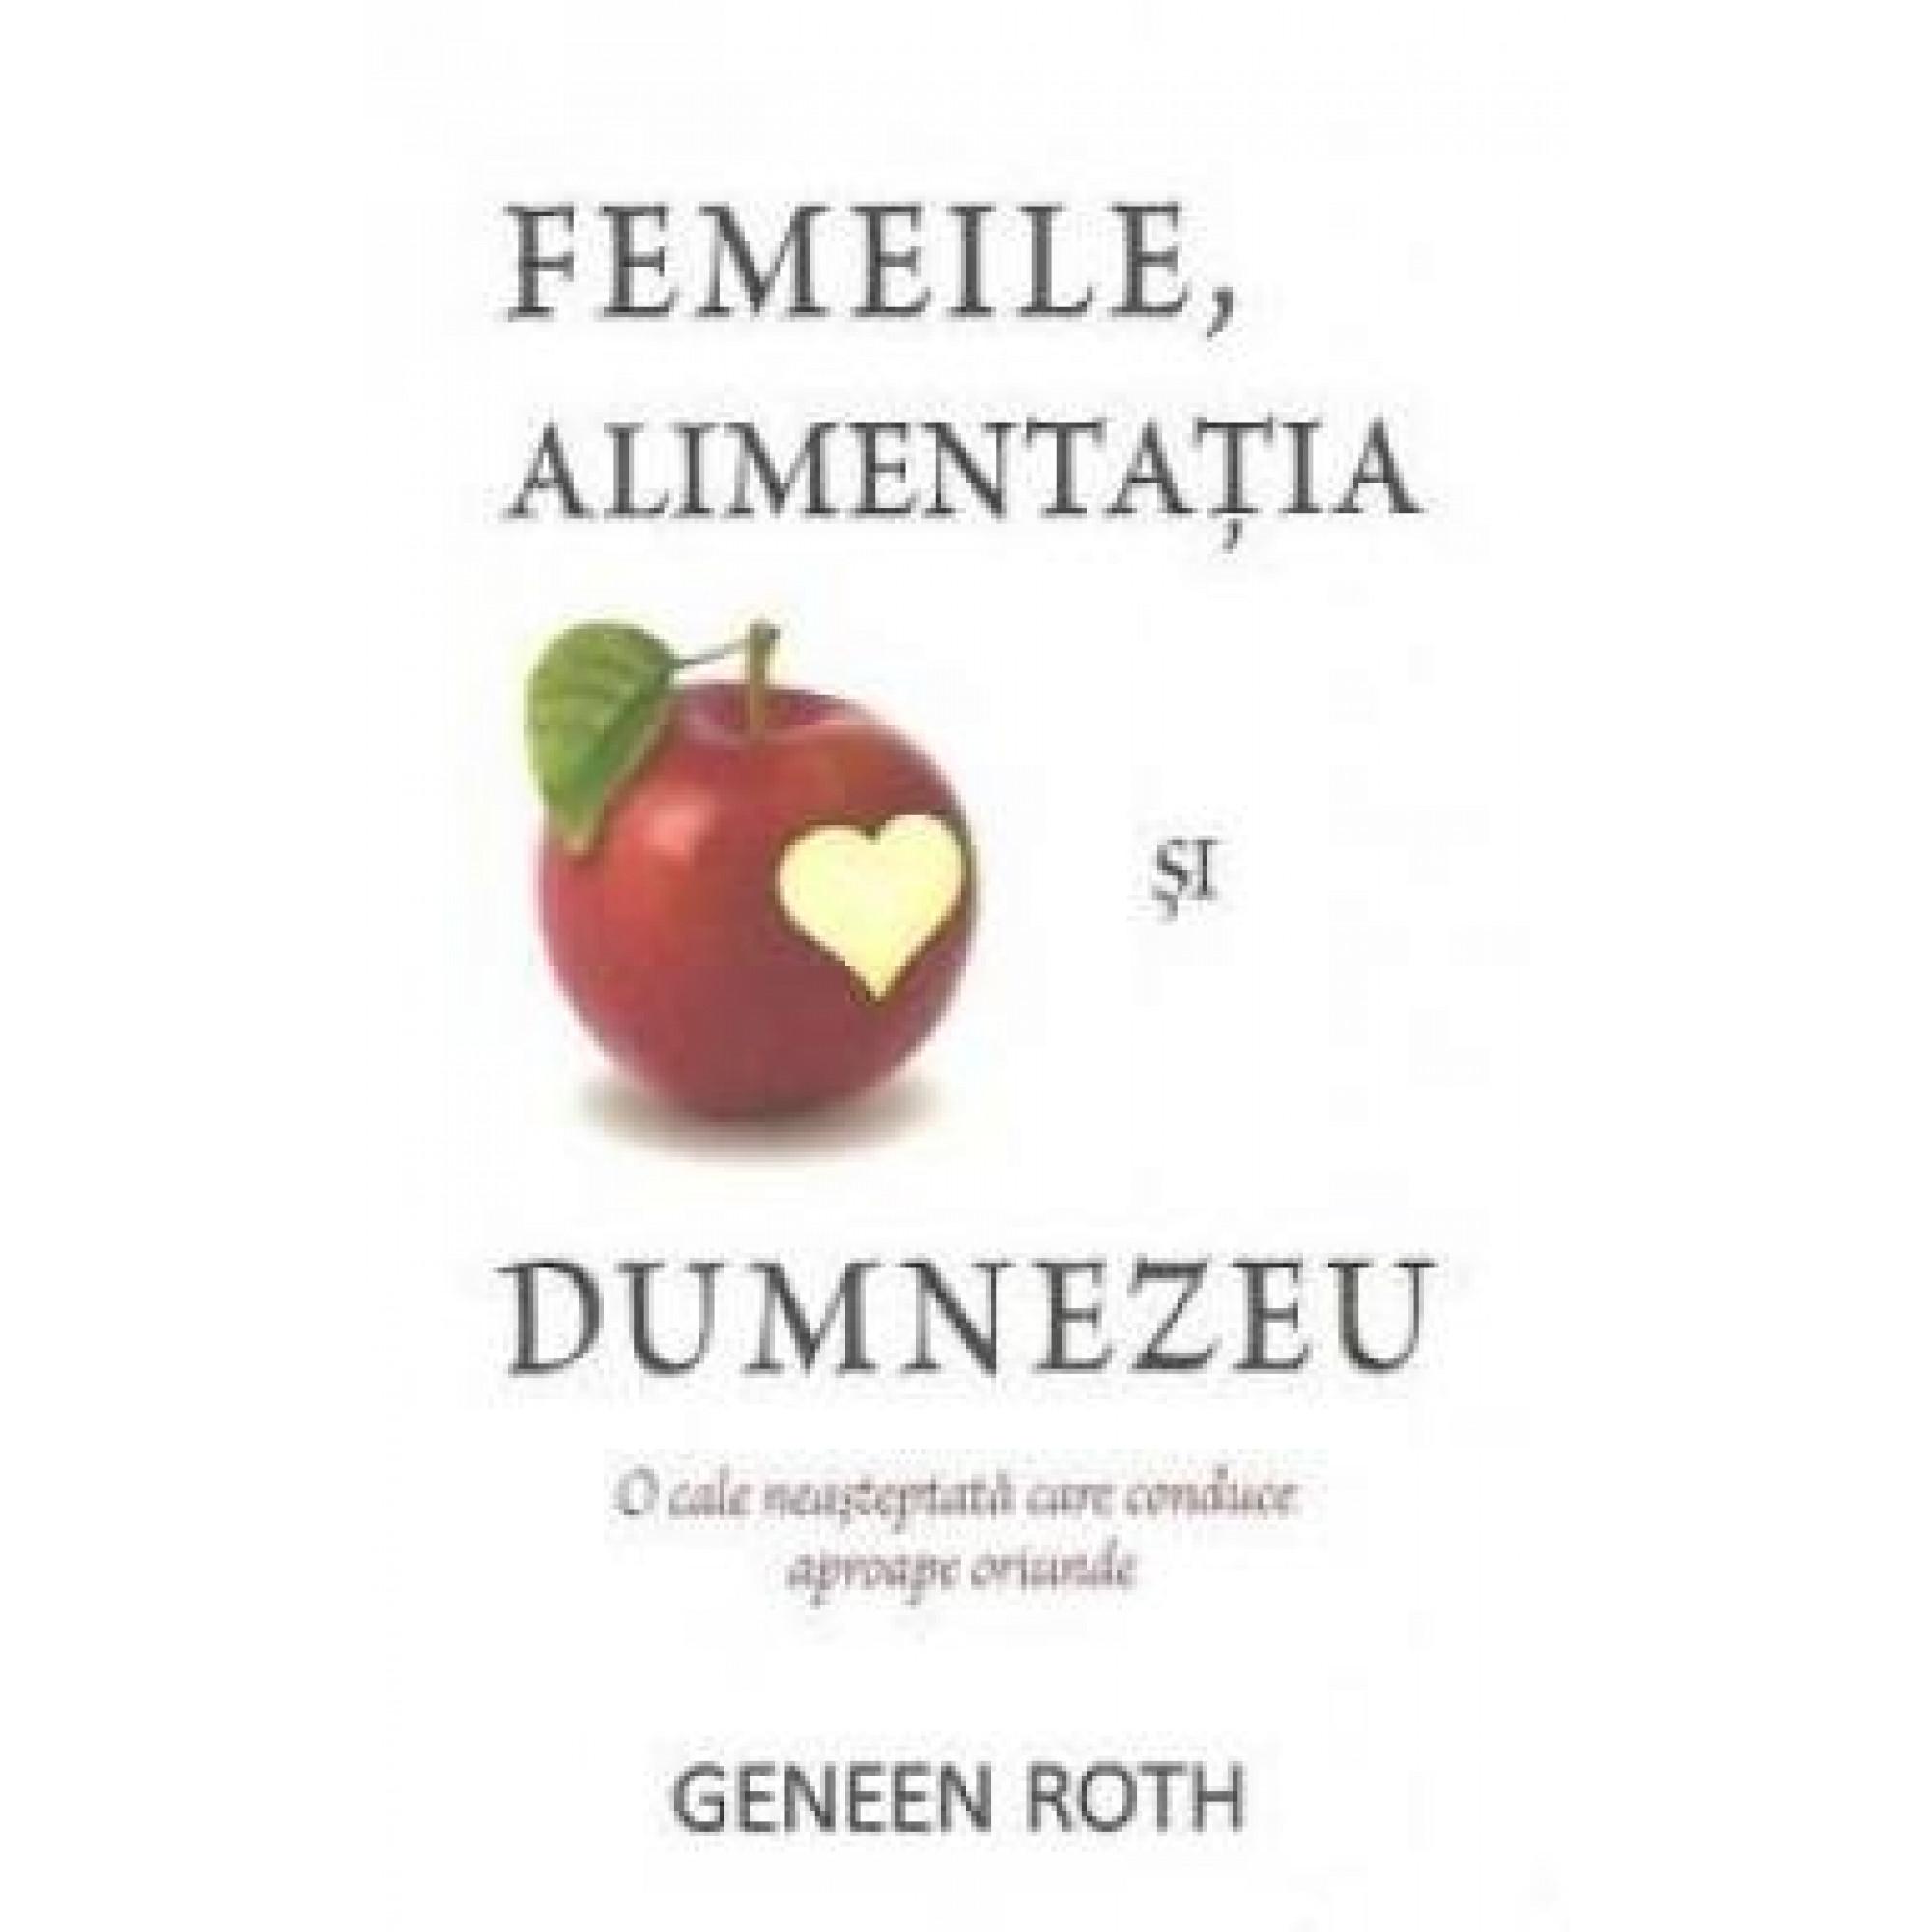 Femeile, alimentația și Dumnezeu